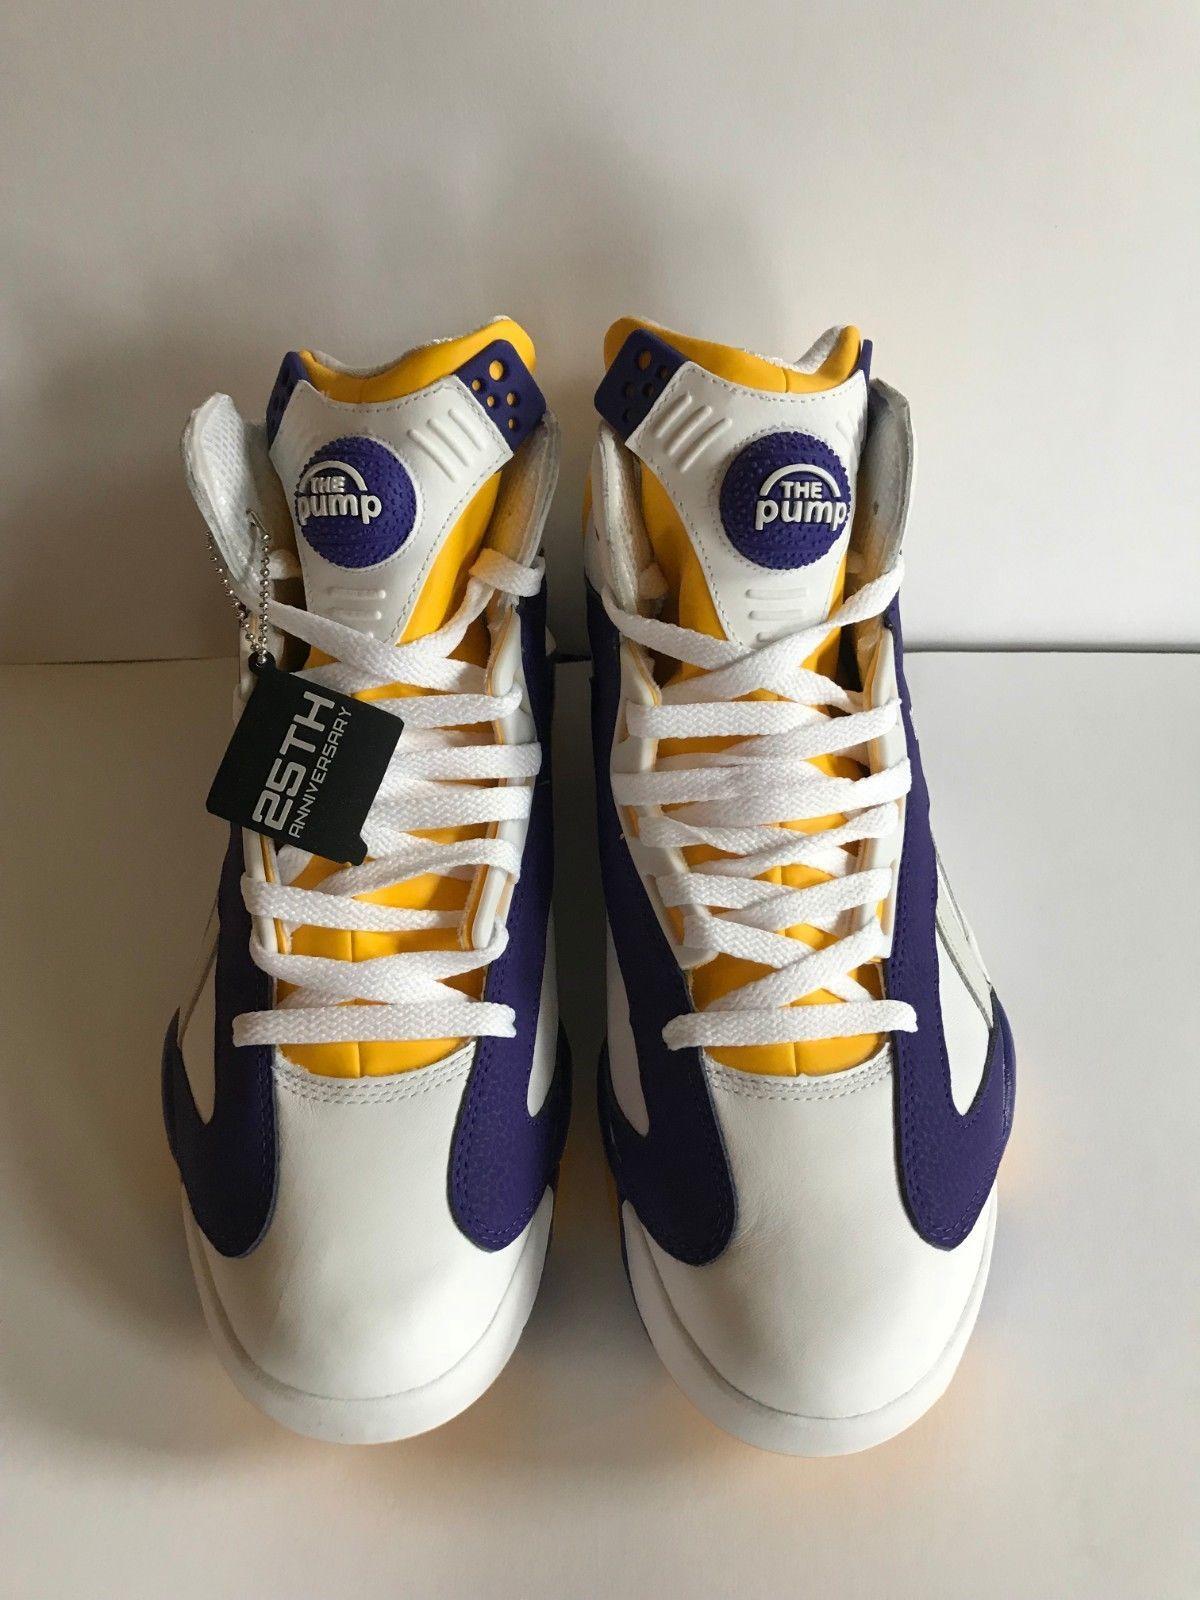 Details about REEBOK SHAQ ATTAQ Pump ALMA MATER LSU Tigers Sneaker ... e28a69d24